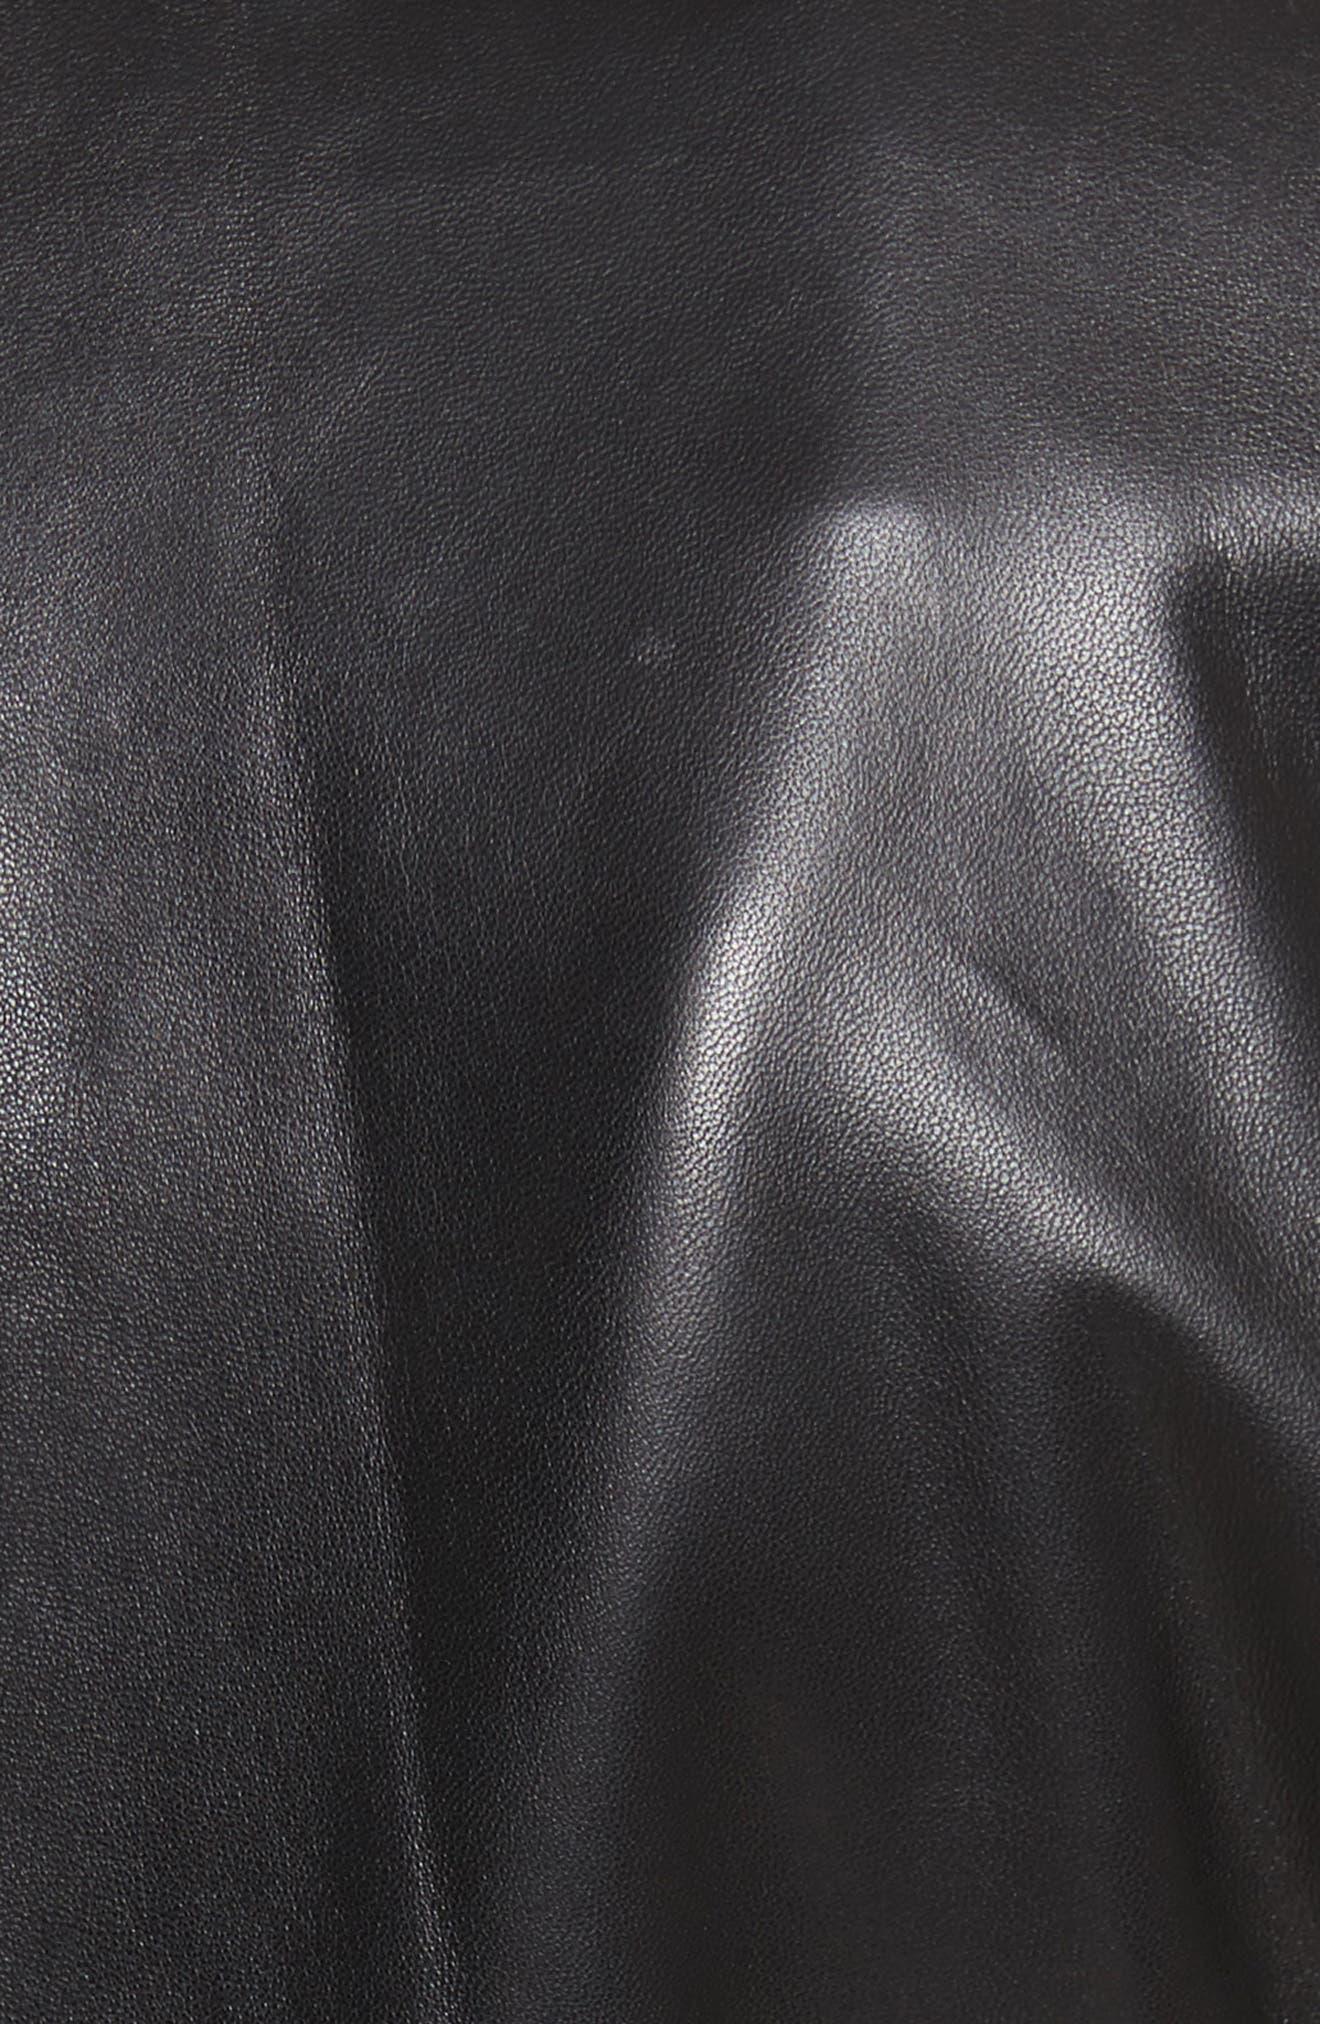 Cooke Leather Jacket,                             Alternate thumbnail 5, color,                             Black